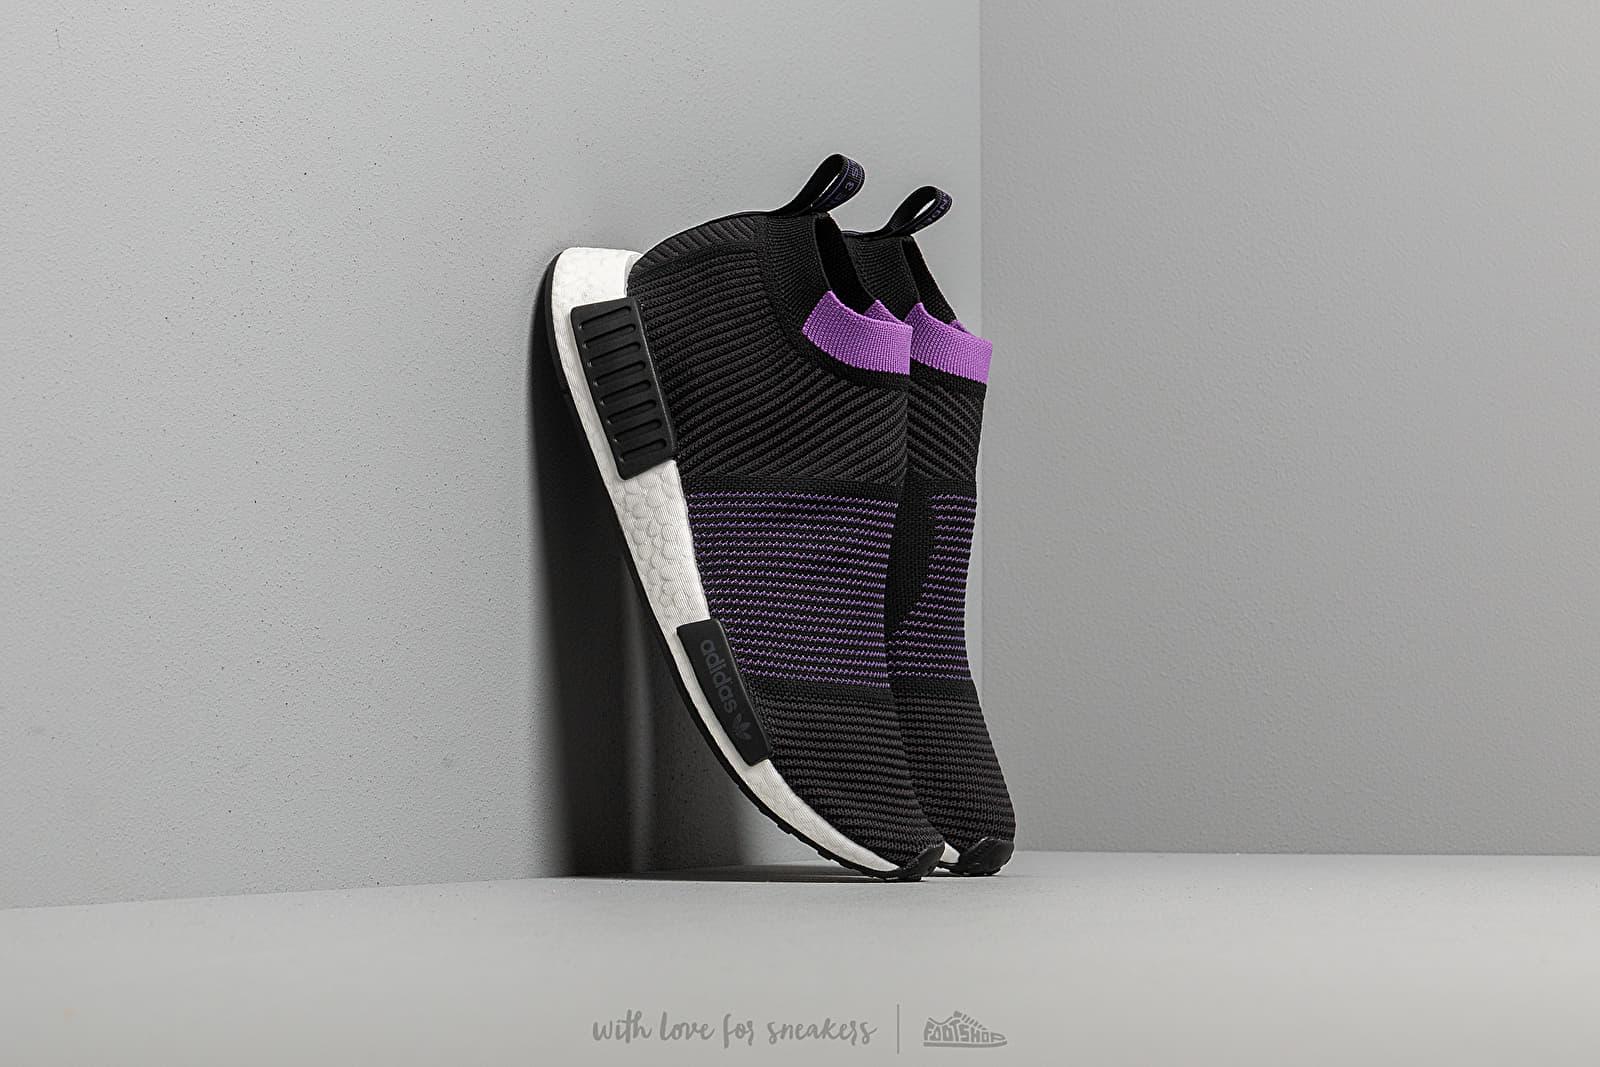 adidas NMD_CS1 PK W Core Black/ Carbon/ Active Purple za skvělou cenu 4 790 Kč koupíte na Footshop.cz